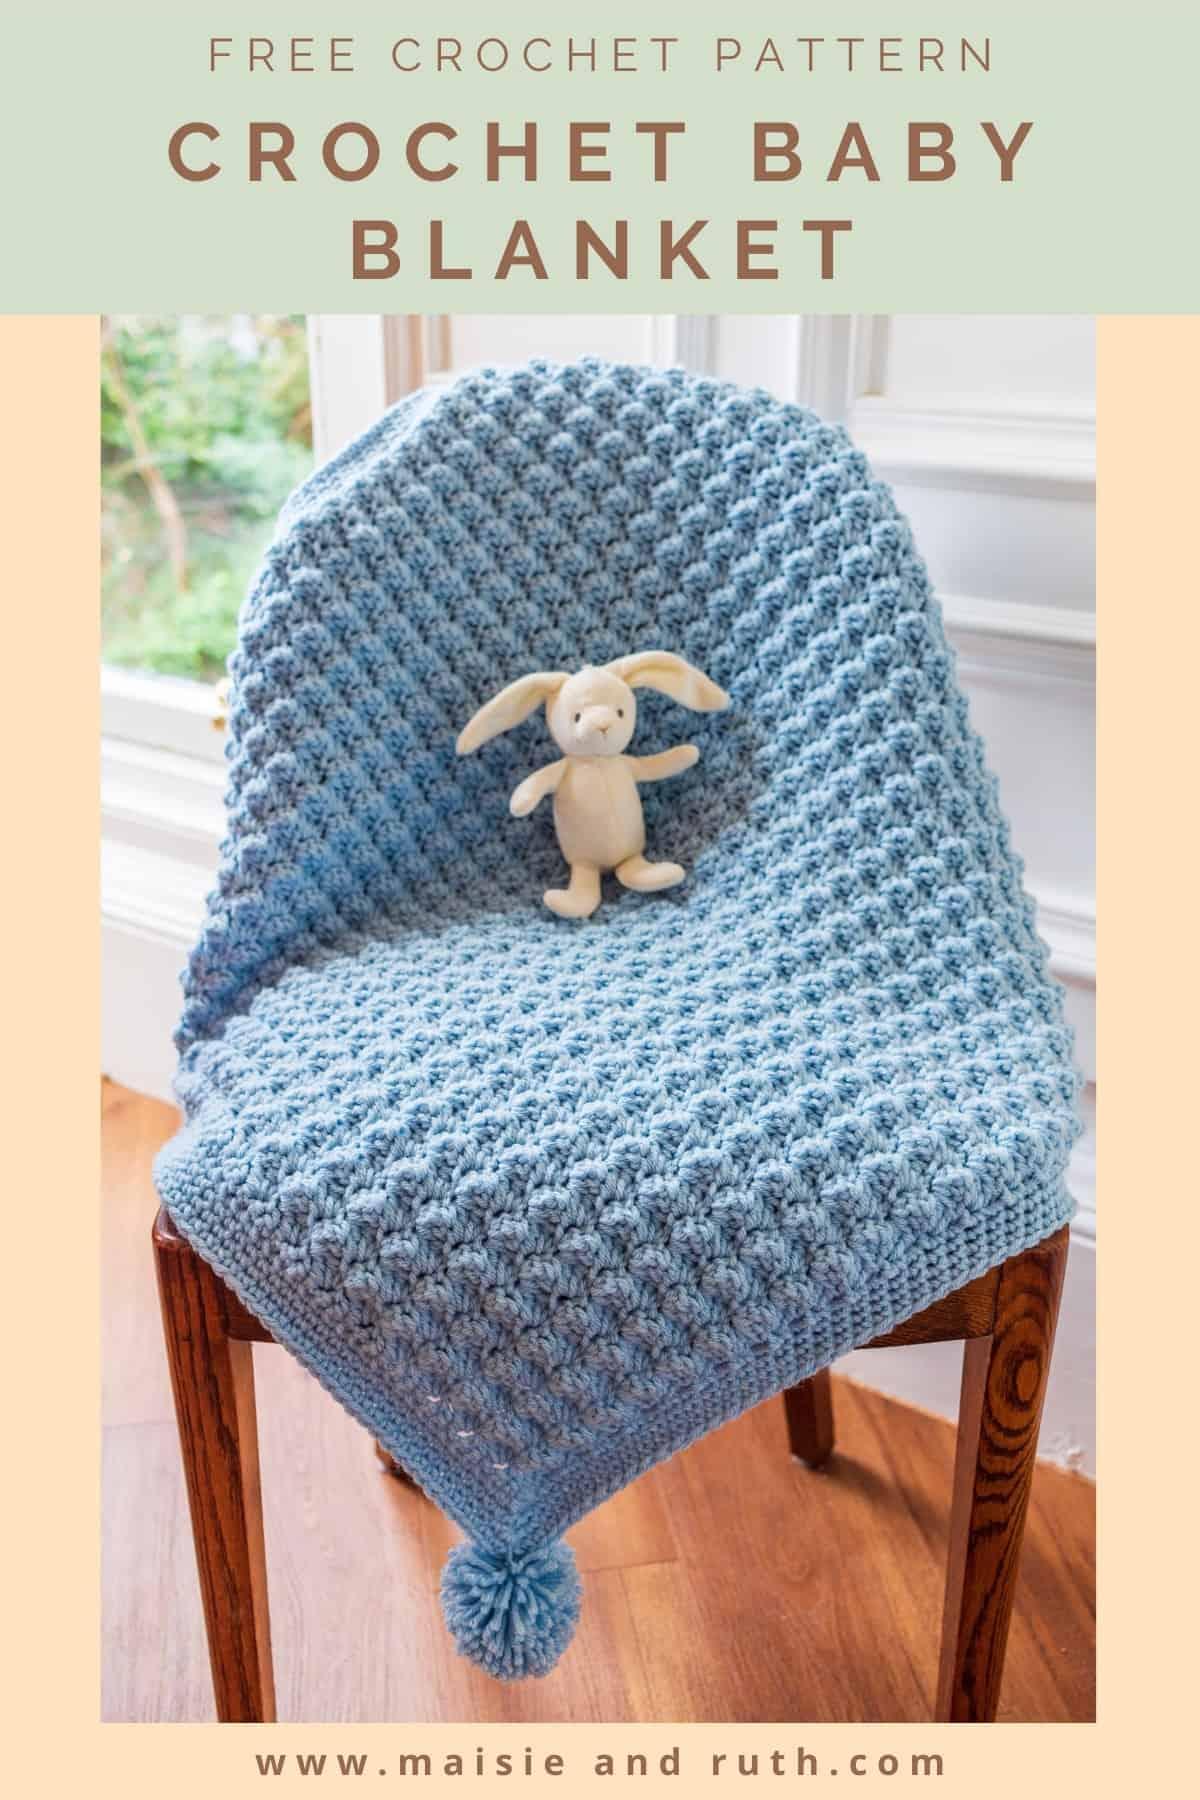 Ripple Stitch Blanket Pin 2